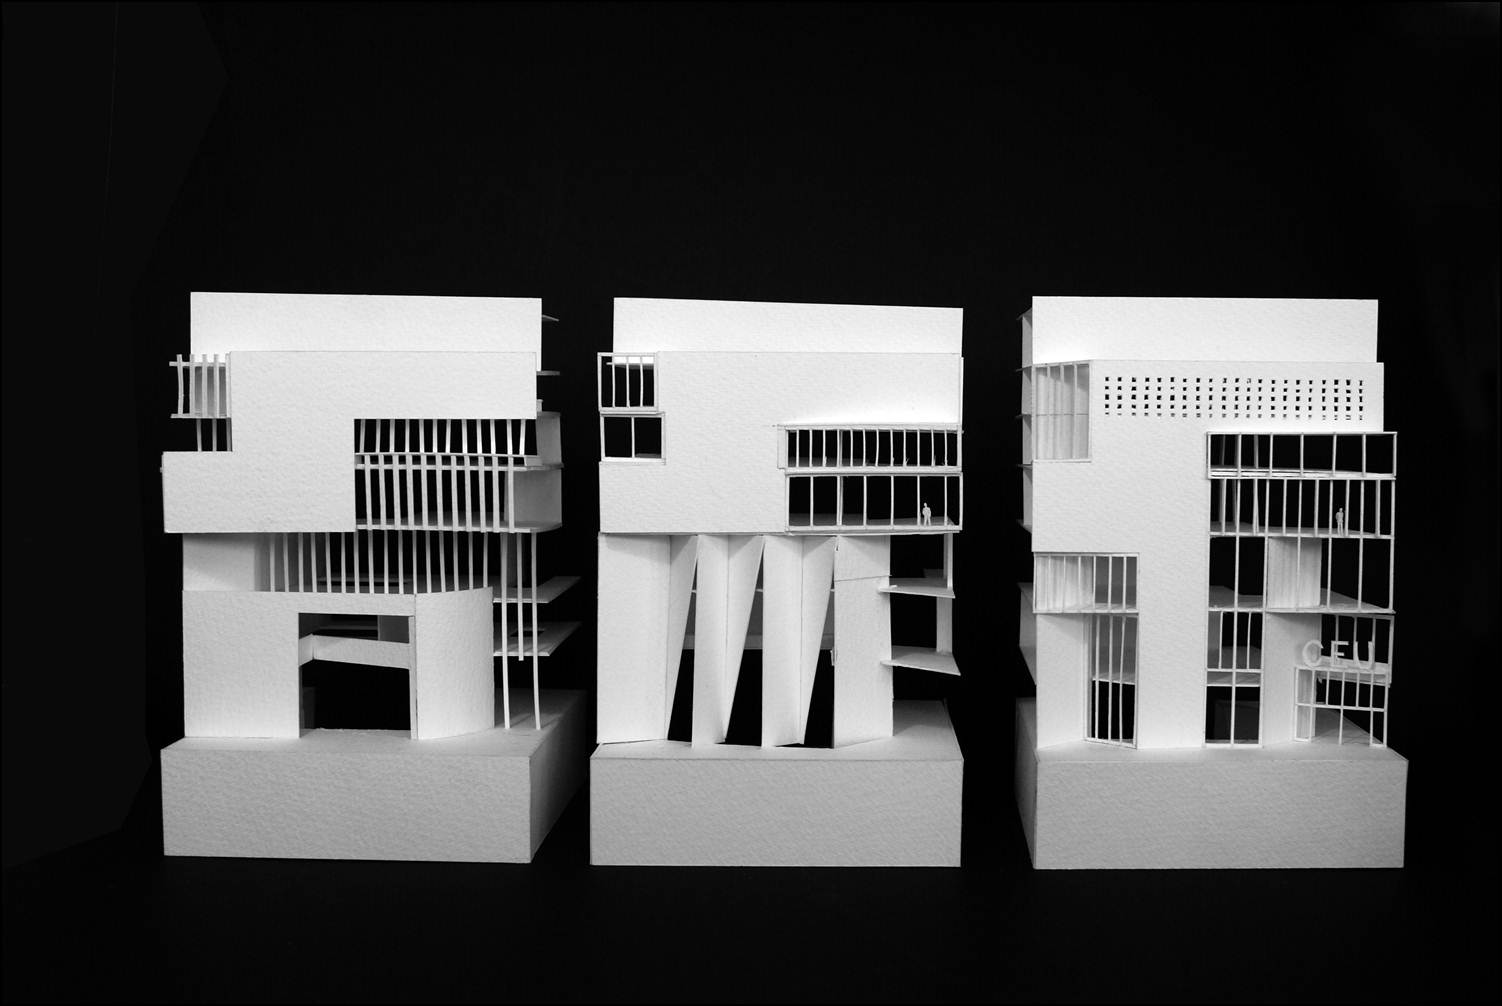 skicc_06_ceu_n15_facade_studies